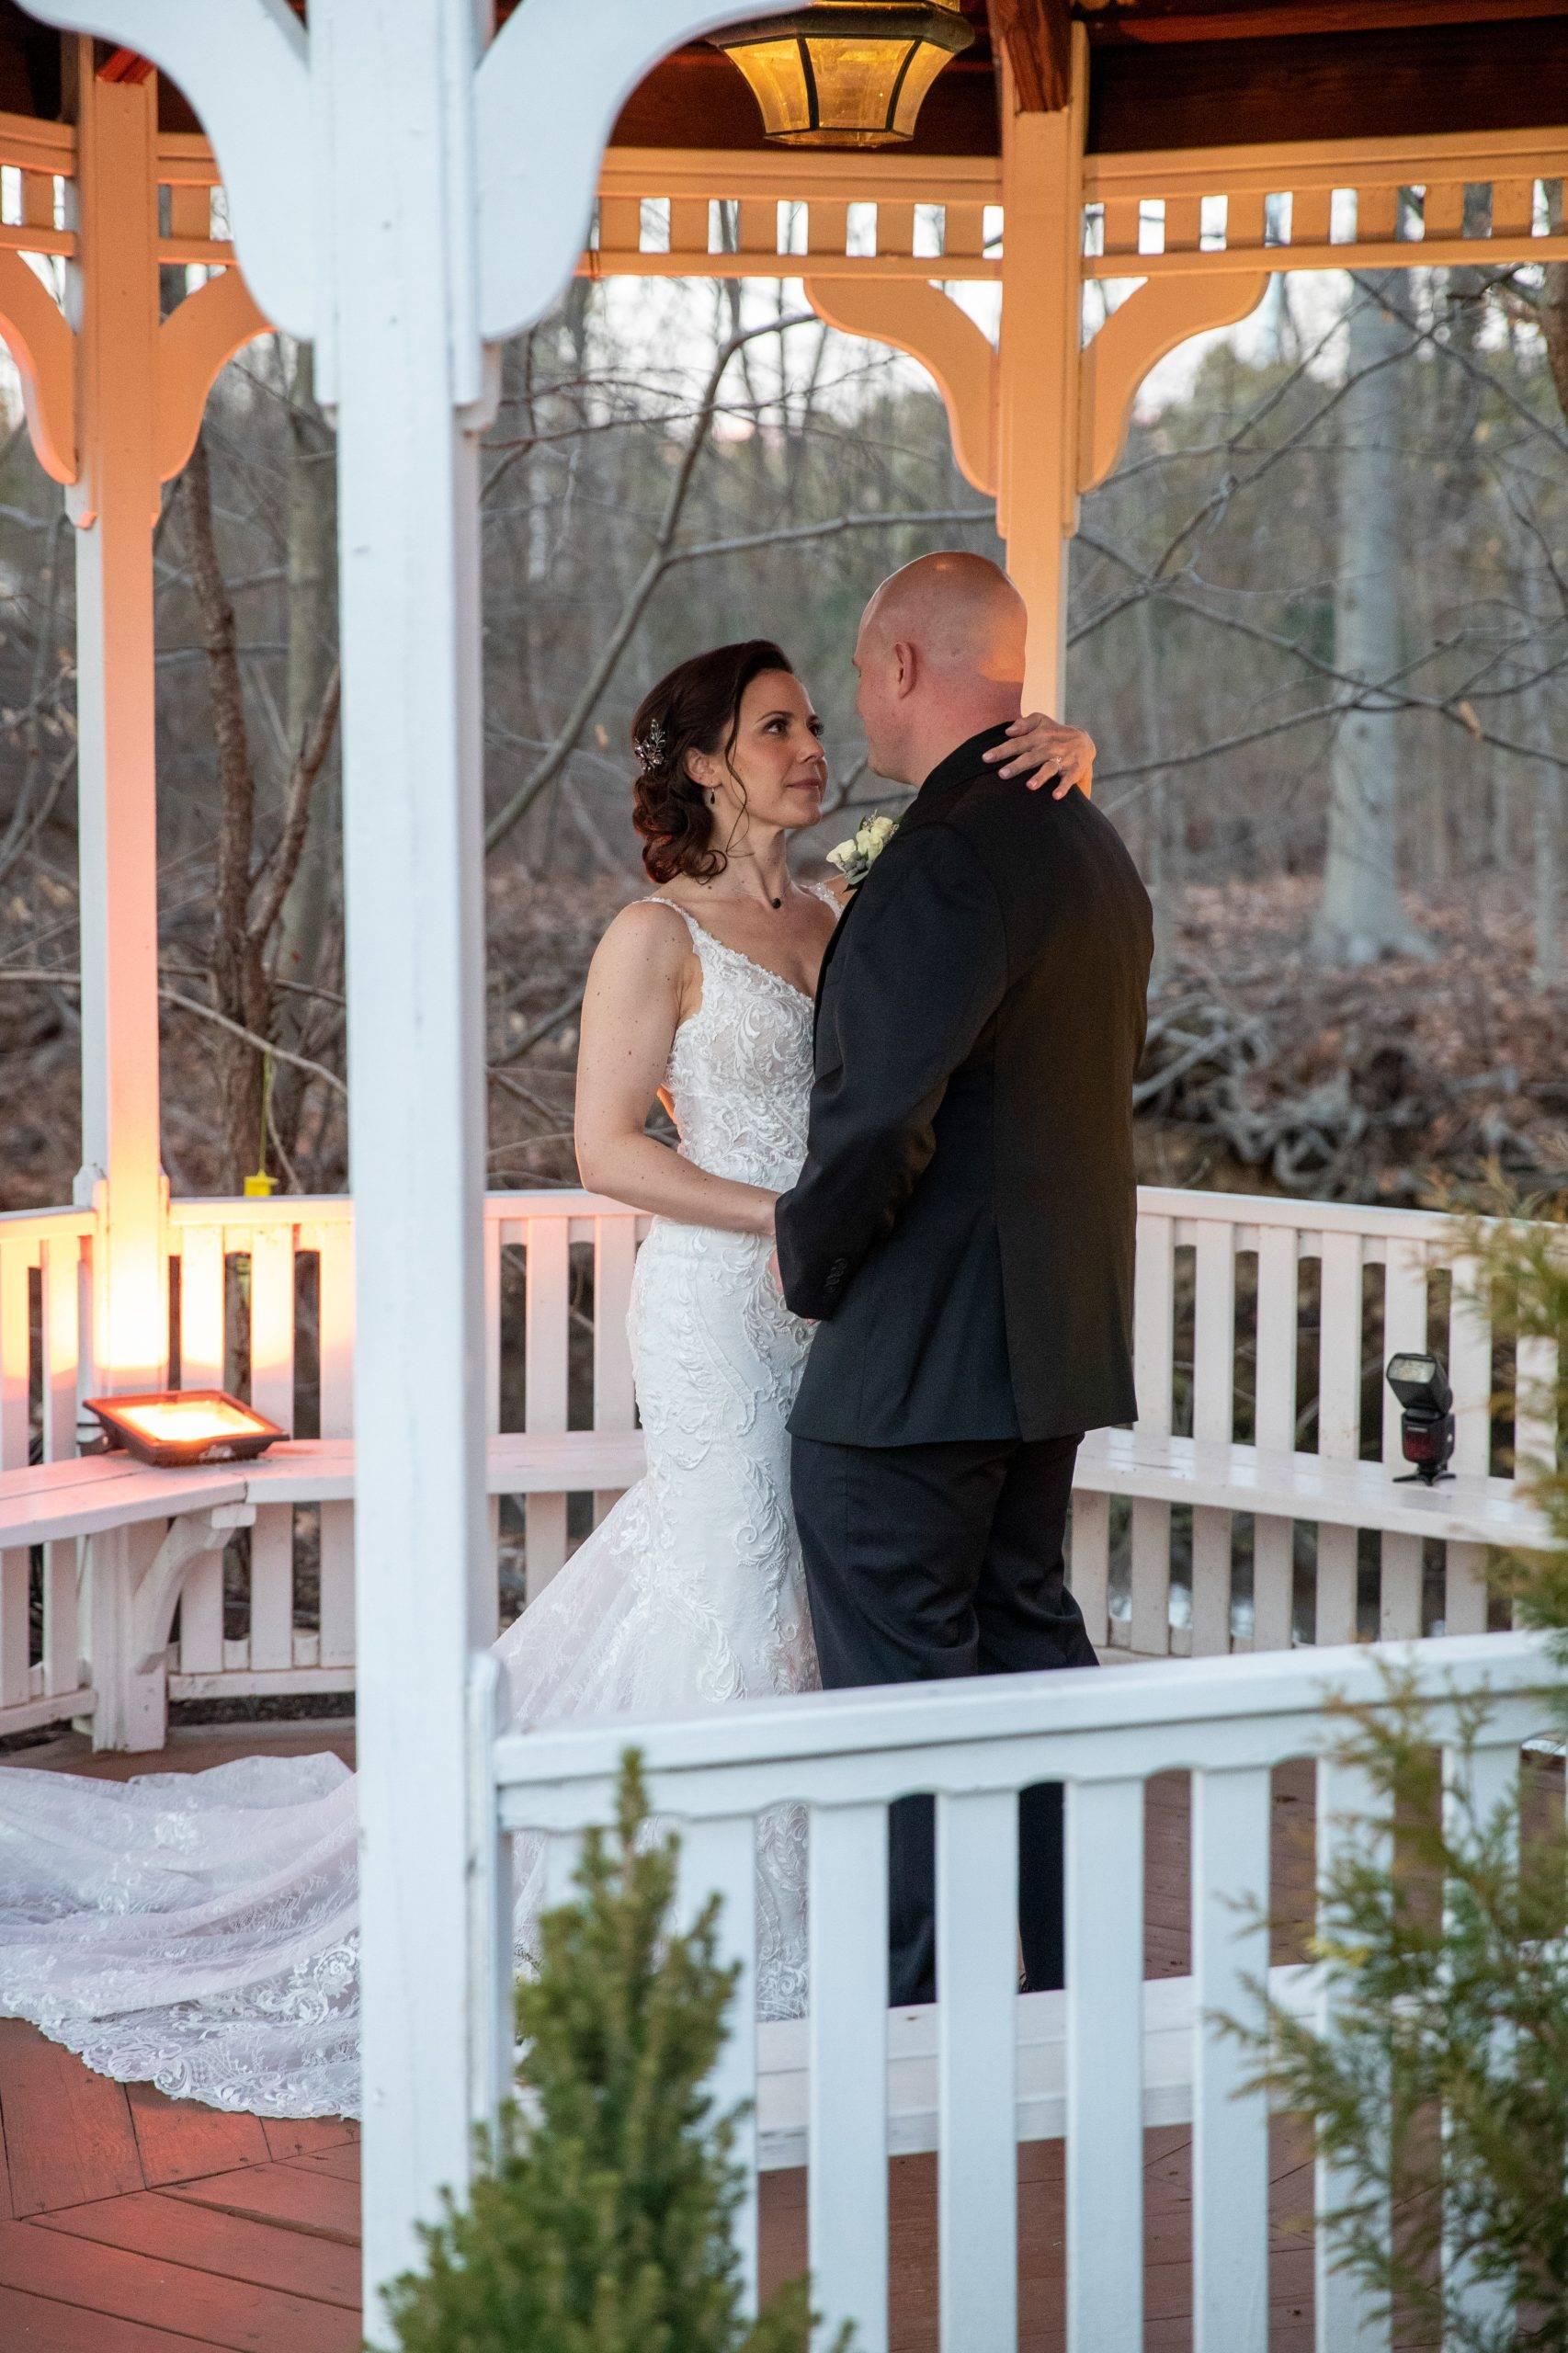 Olde Mill Inn bride and groom in gazebo